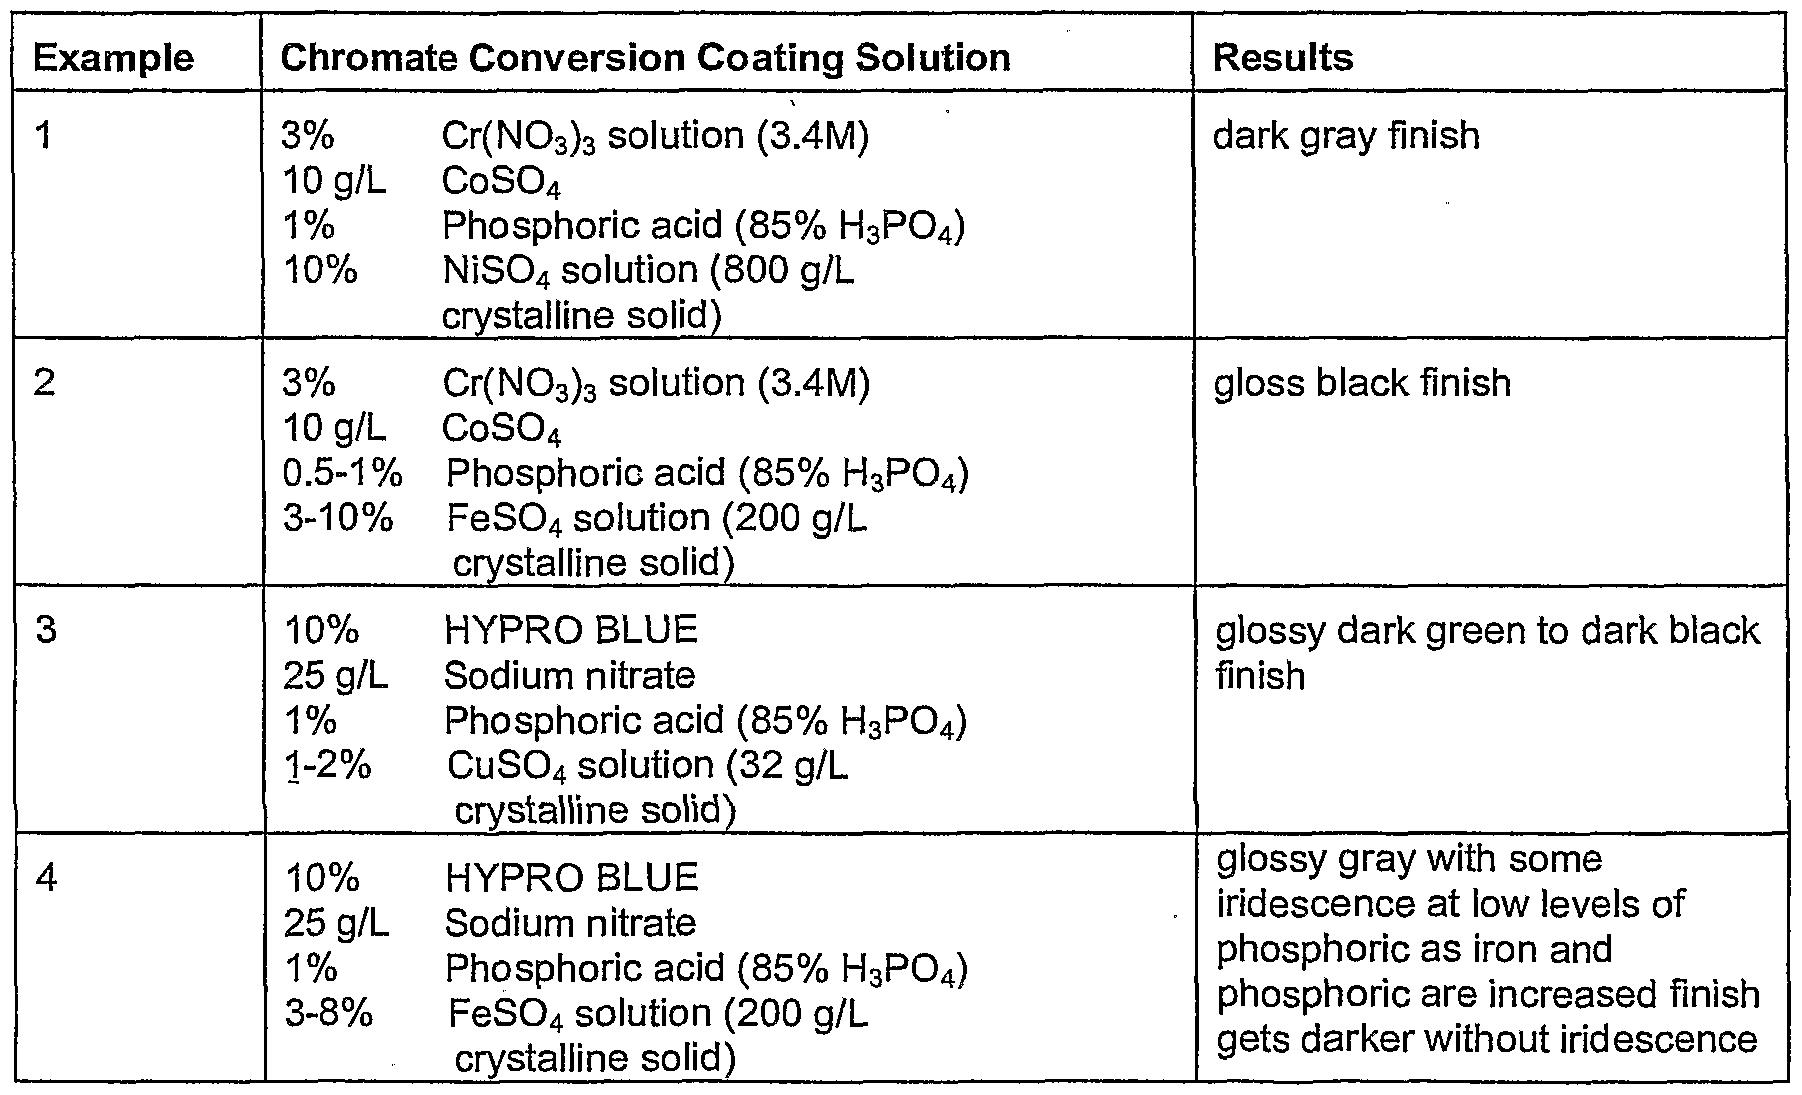 Zinc Chromate Process Chromate Conversion Coating